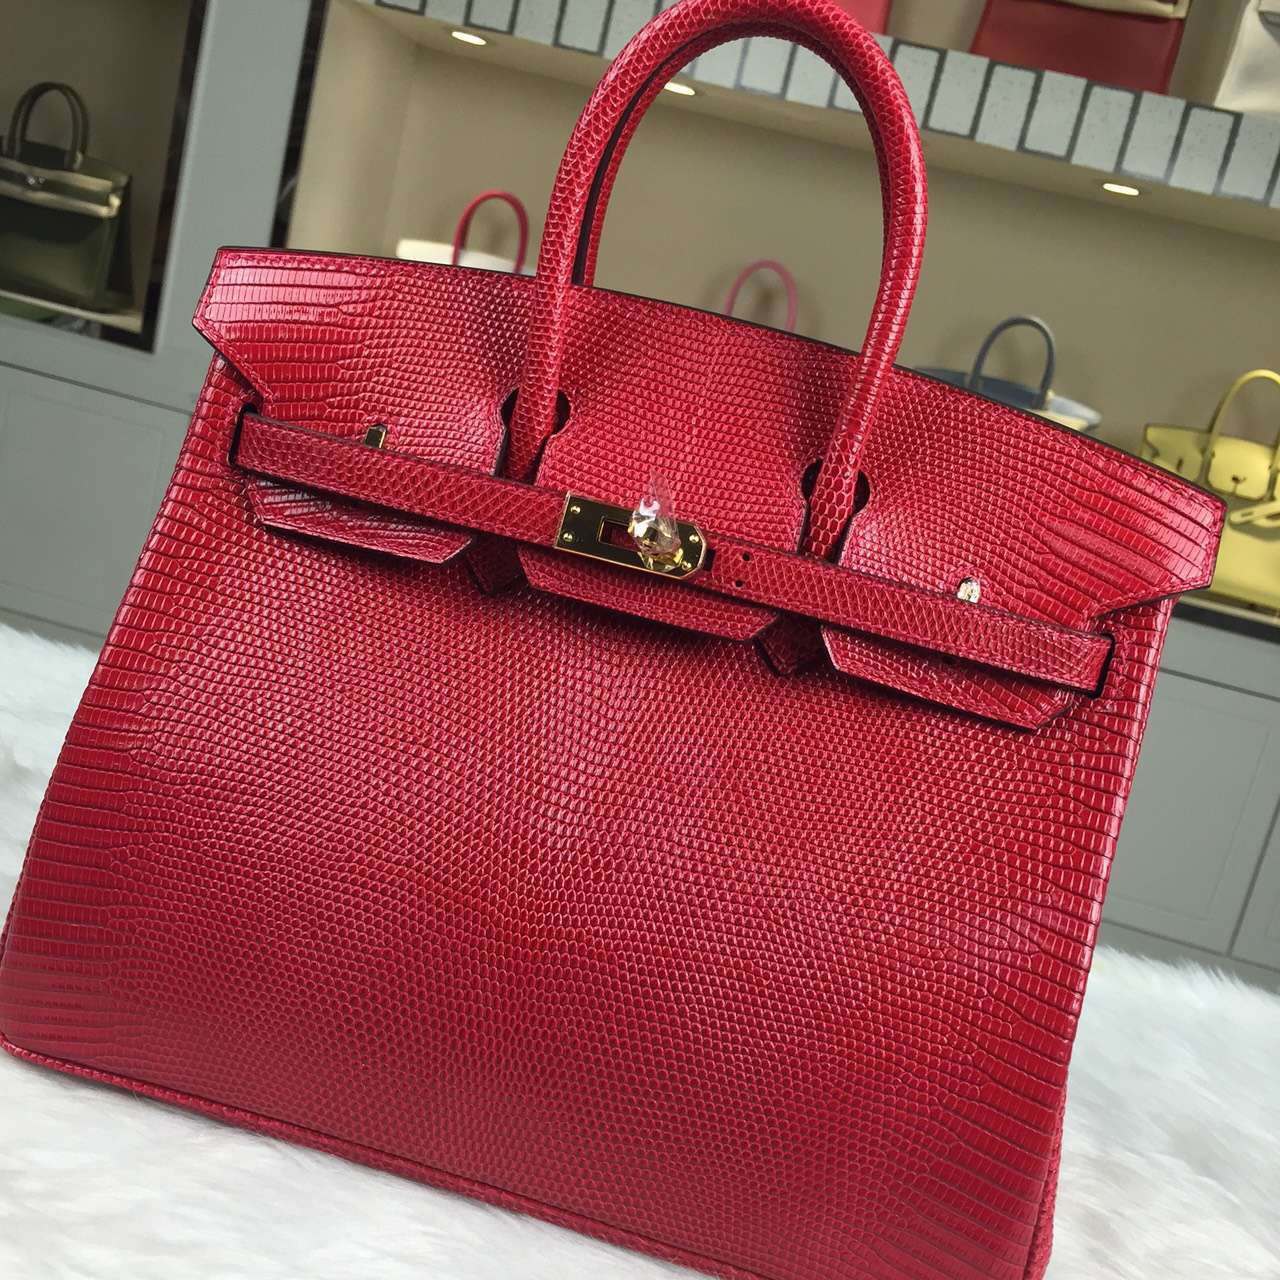 Hermes Custome-made France Lizard Skin Leather Red Birkin Bag25cm Gold Hardware